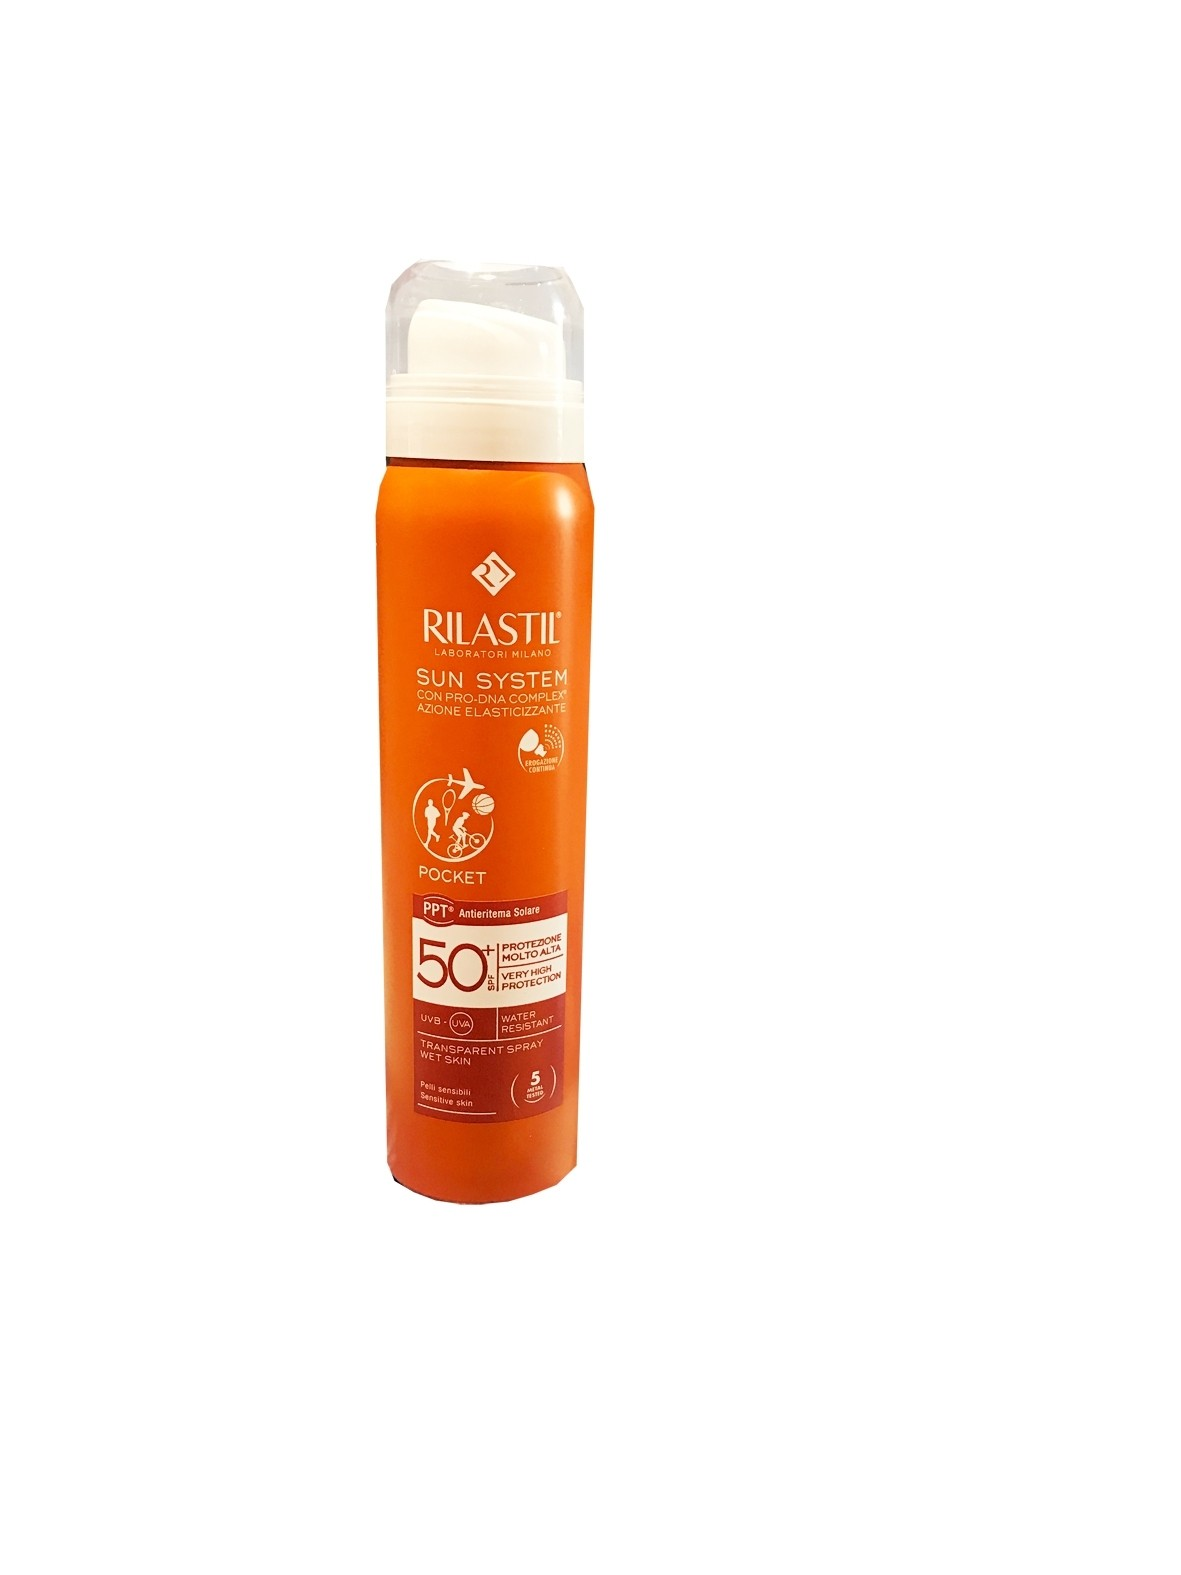 Rilastil Sun System Spray Trasparente Pocket Spf 50+ 75ml